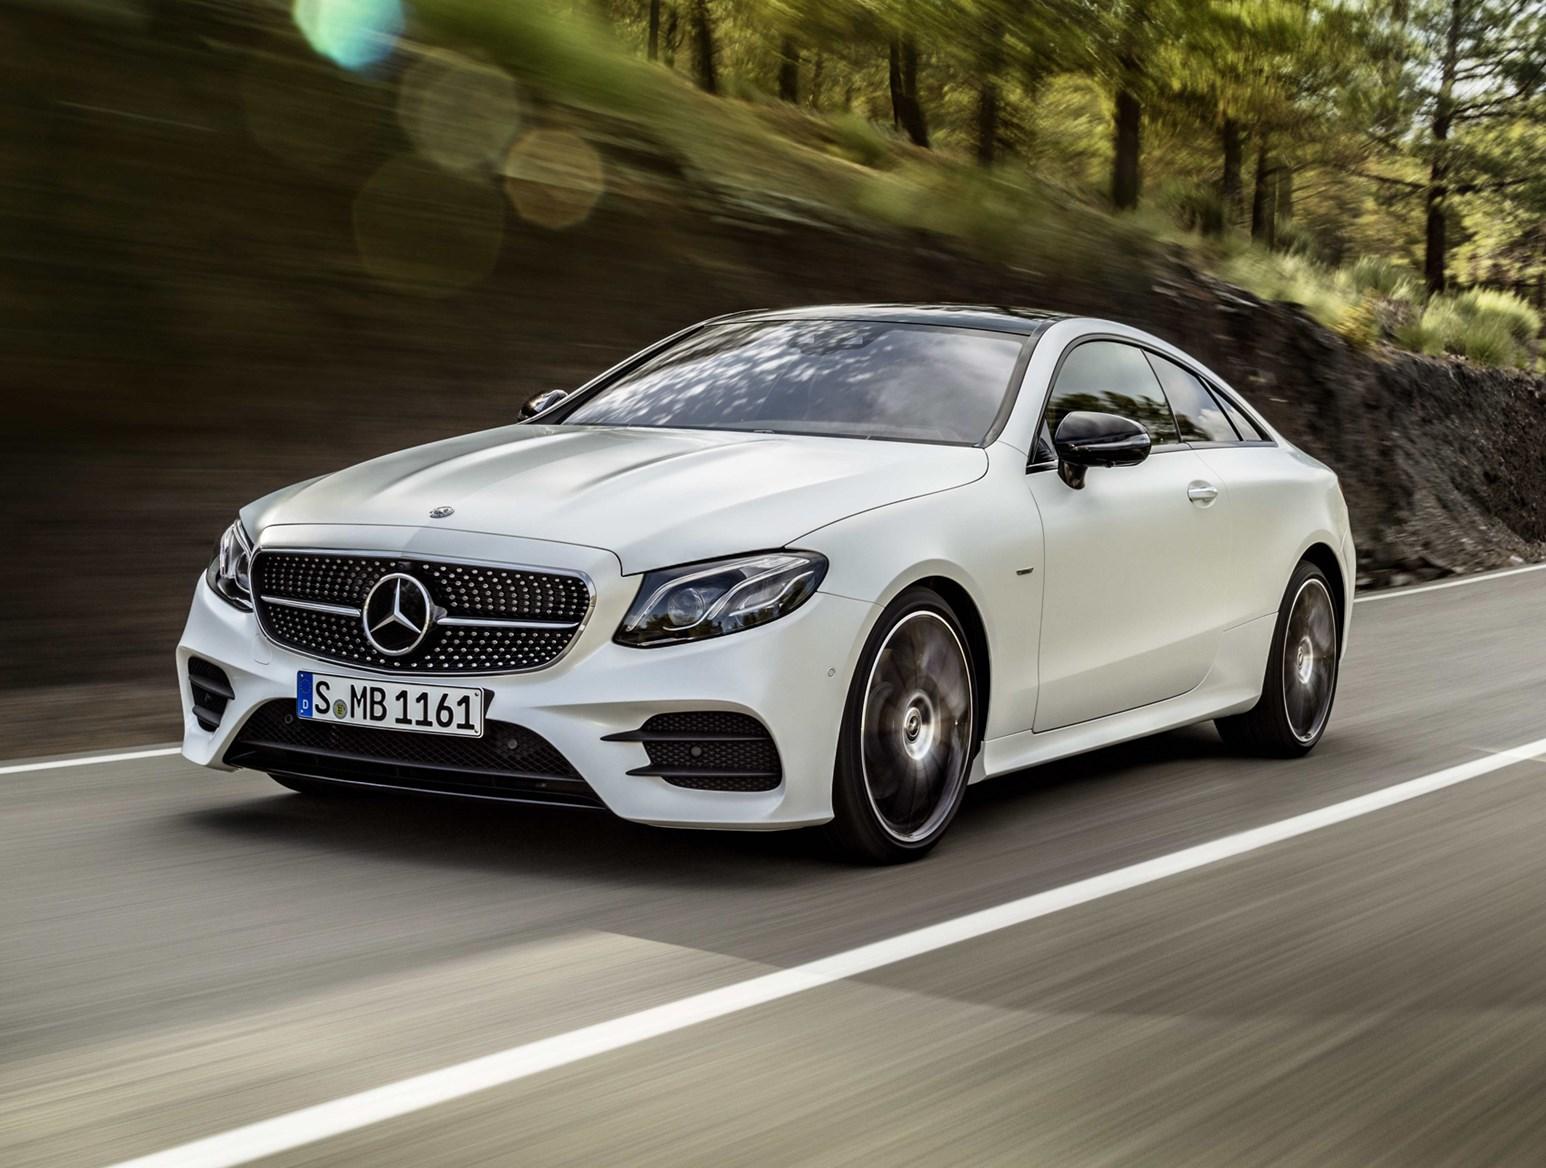 Mercedes Benz 2017 E Cl Coupe Driving